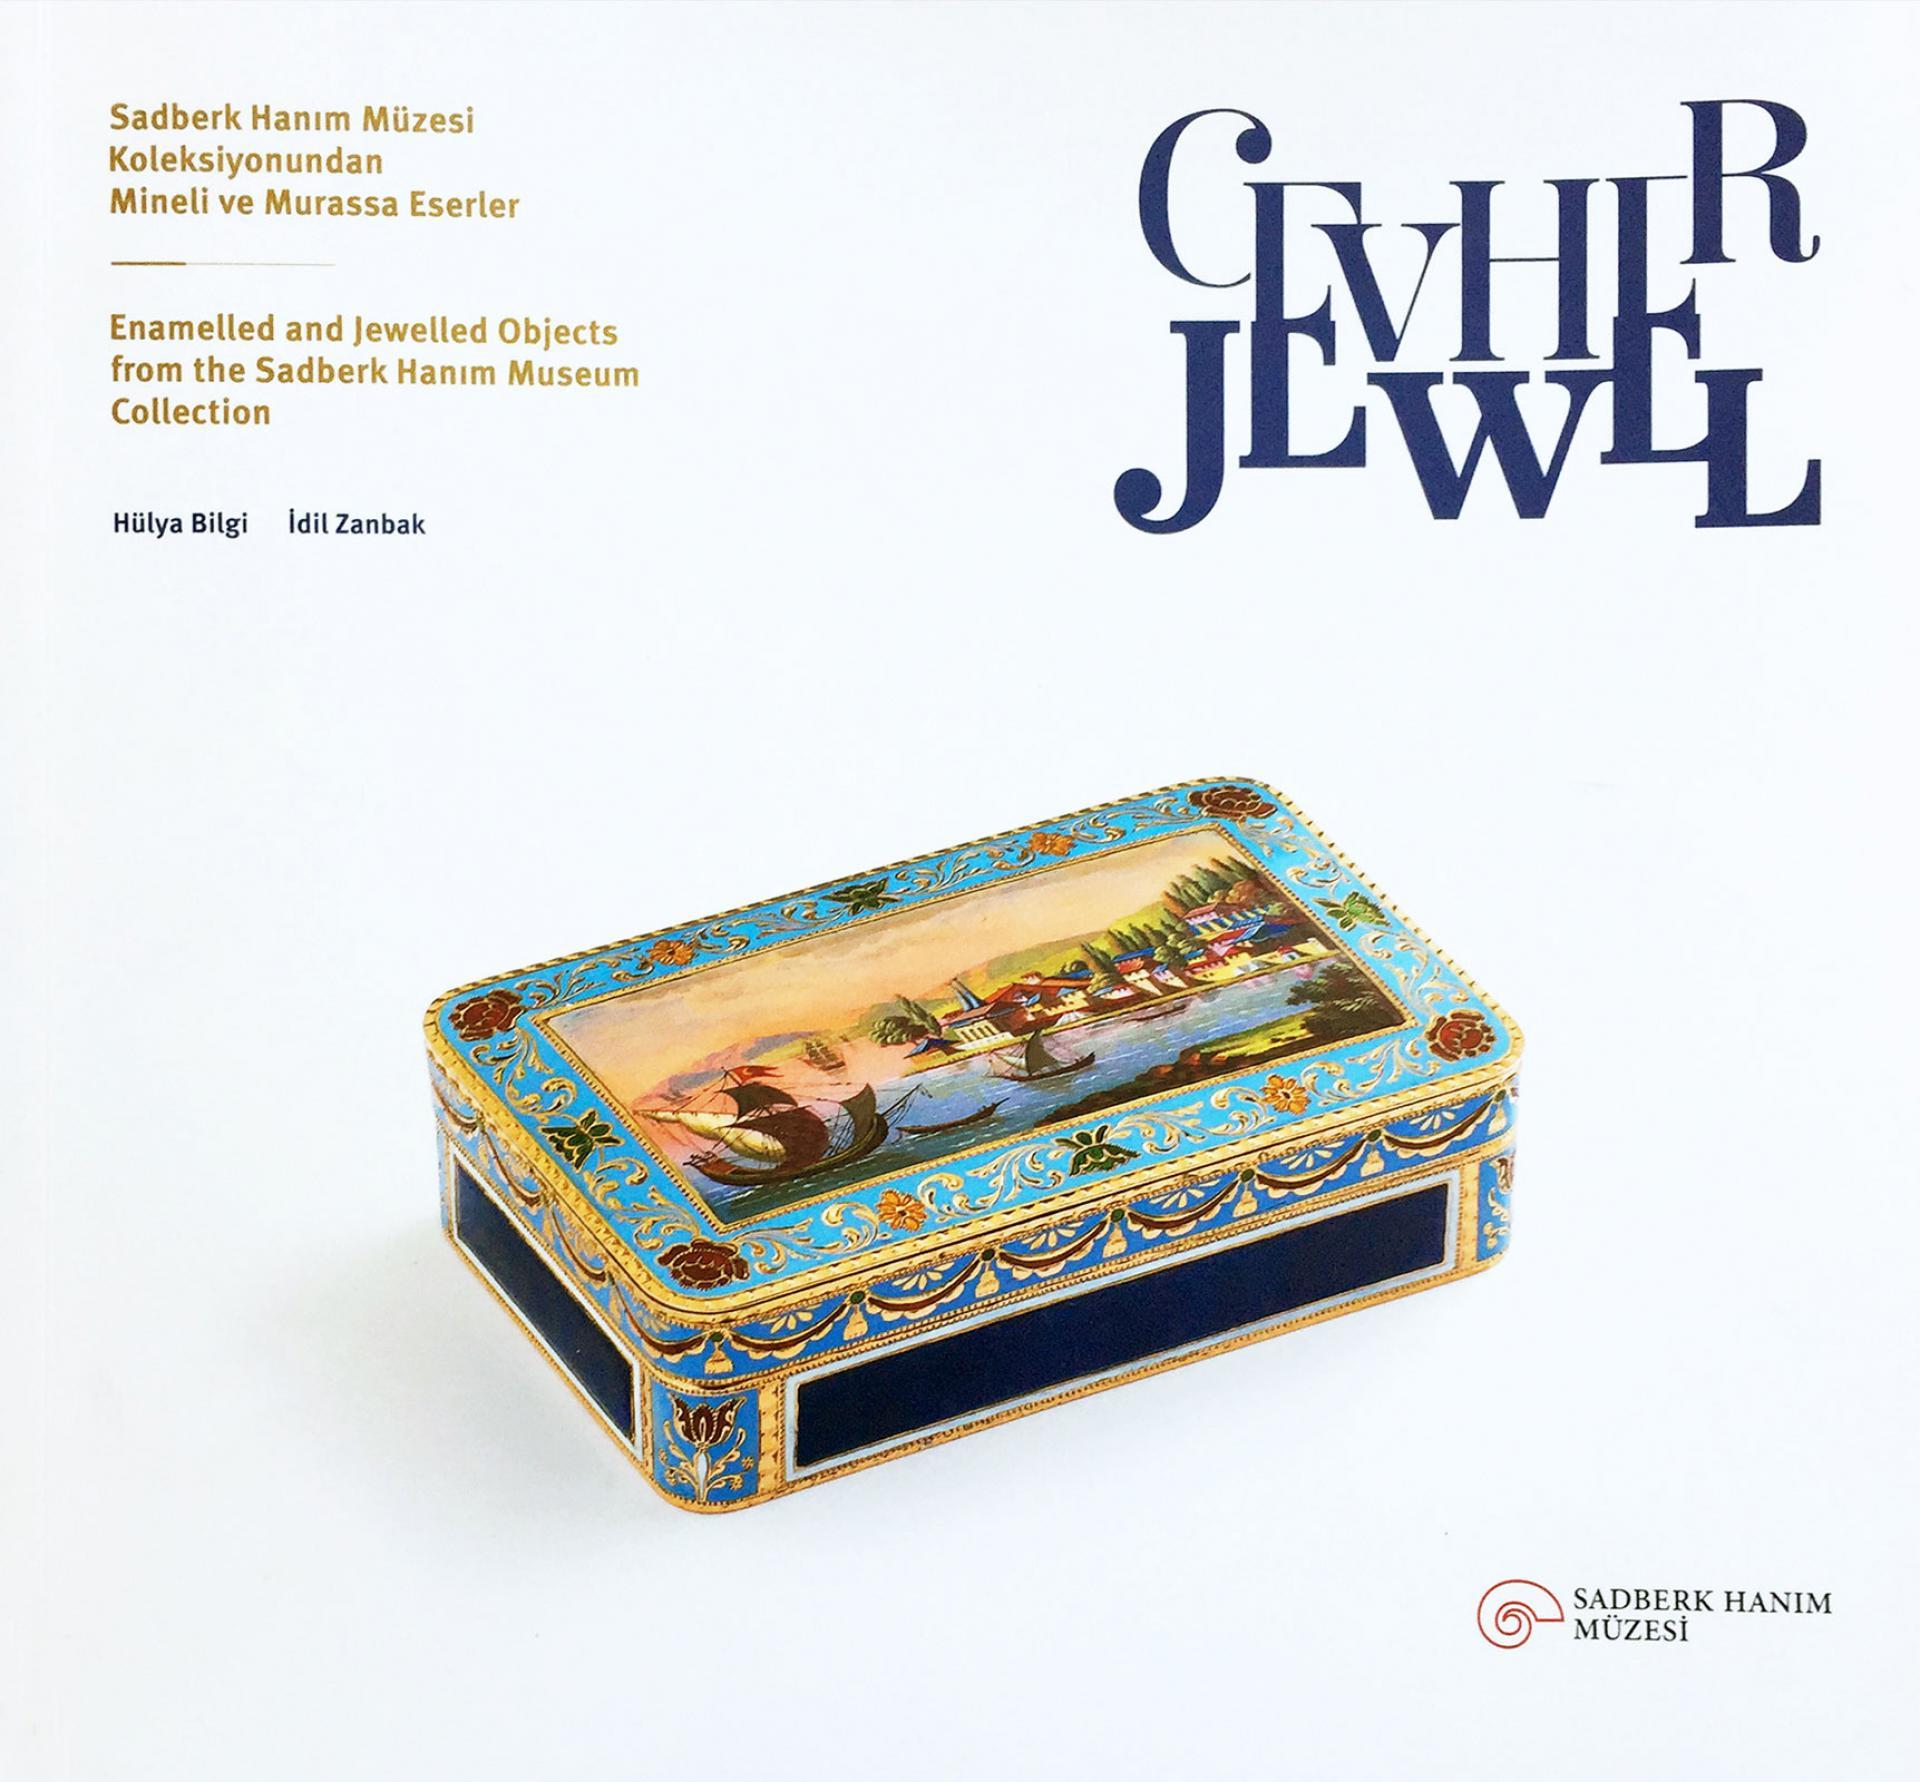 Jewel - Enamelled and Jewelled Objects From The Sadberk Hanım Museum Collection - BOOKS - Sadberk Hanım Museum